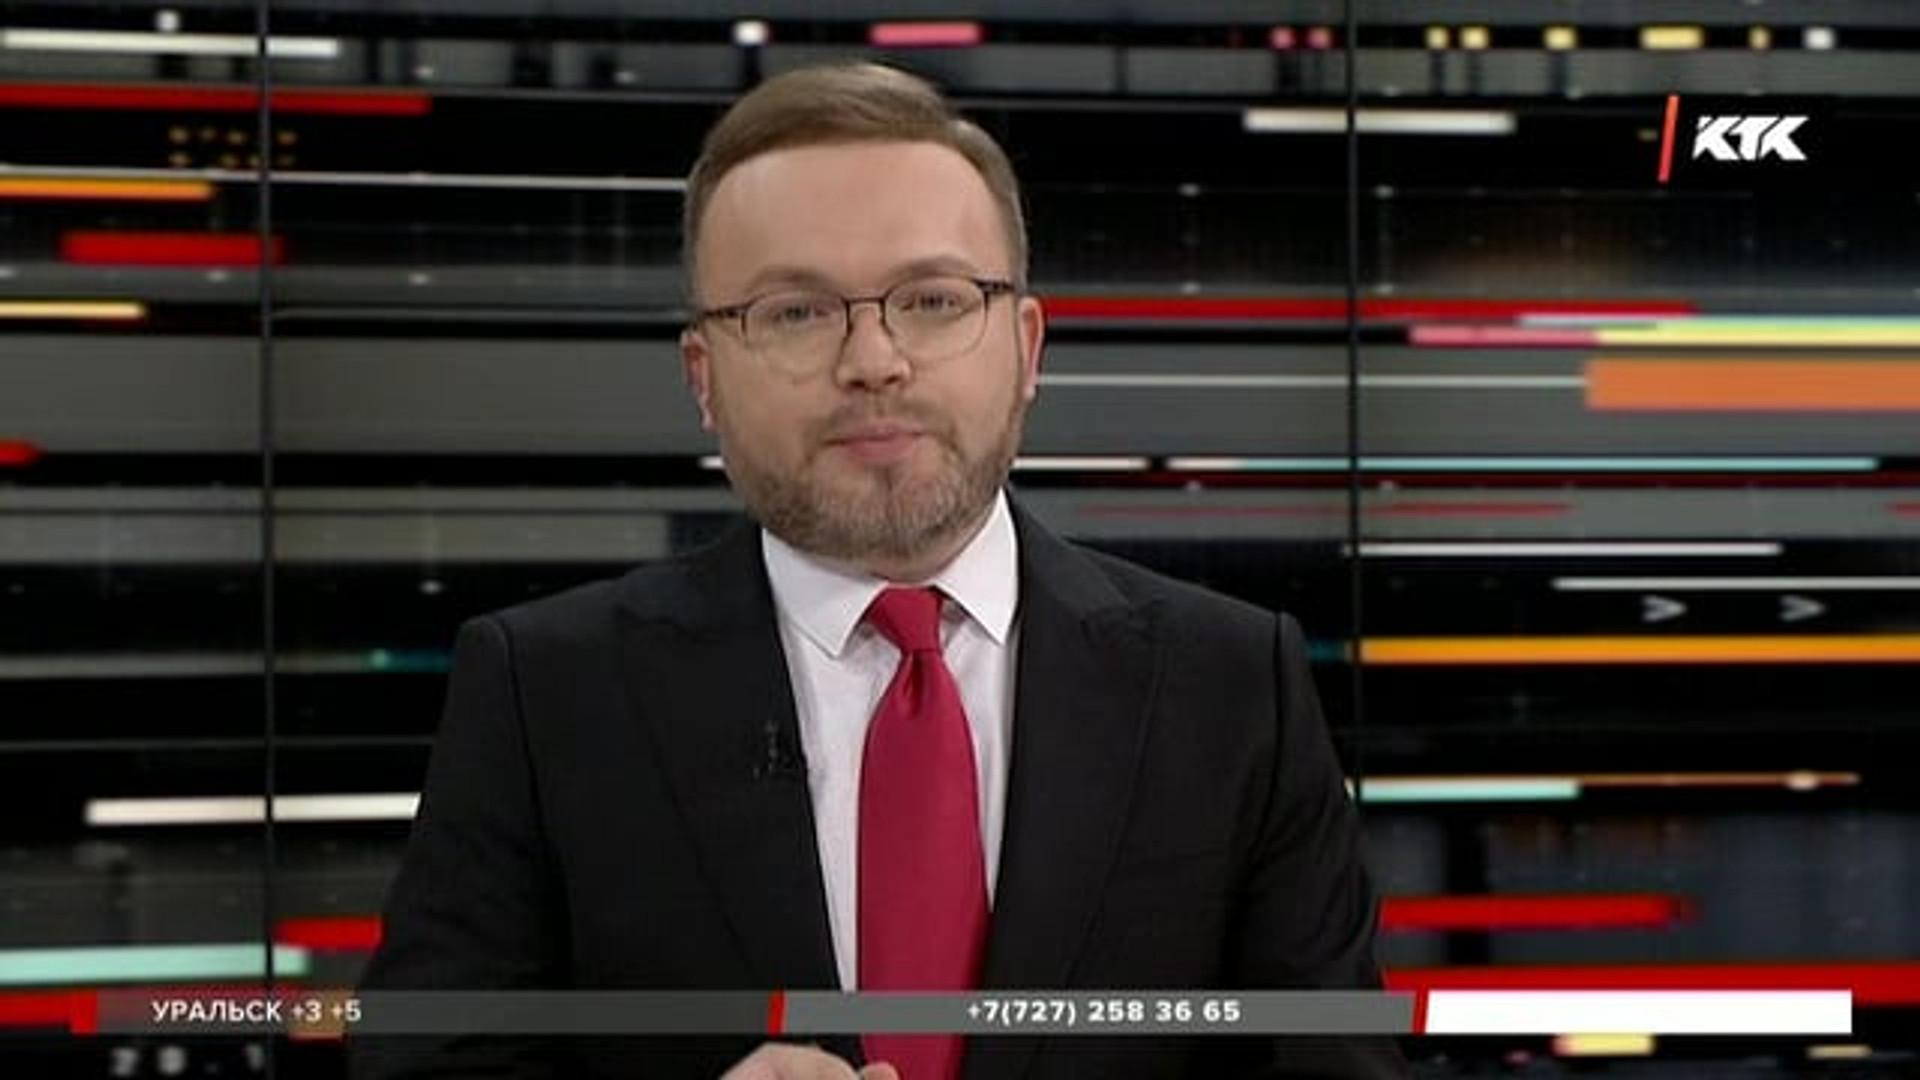 Record-Breaking Paris: Ignace Meuwissen €65 M transaction to Kazan buyer (KTK Kazakhstan)